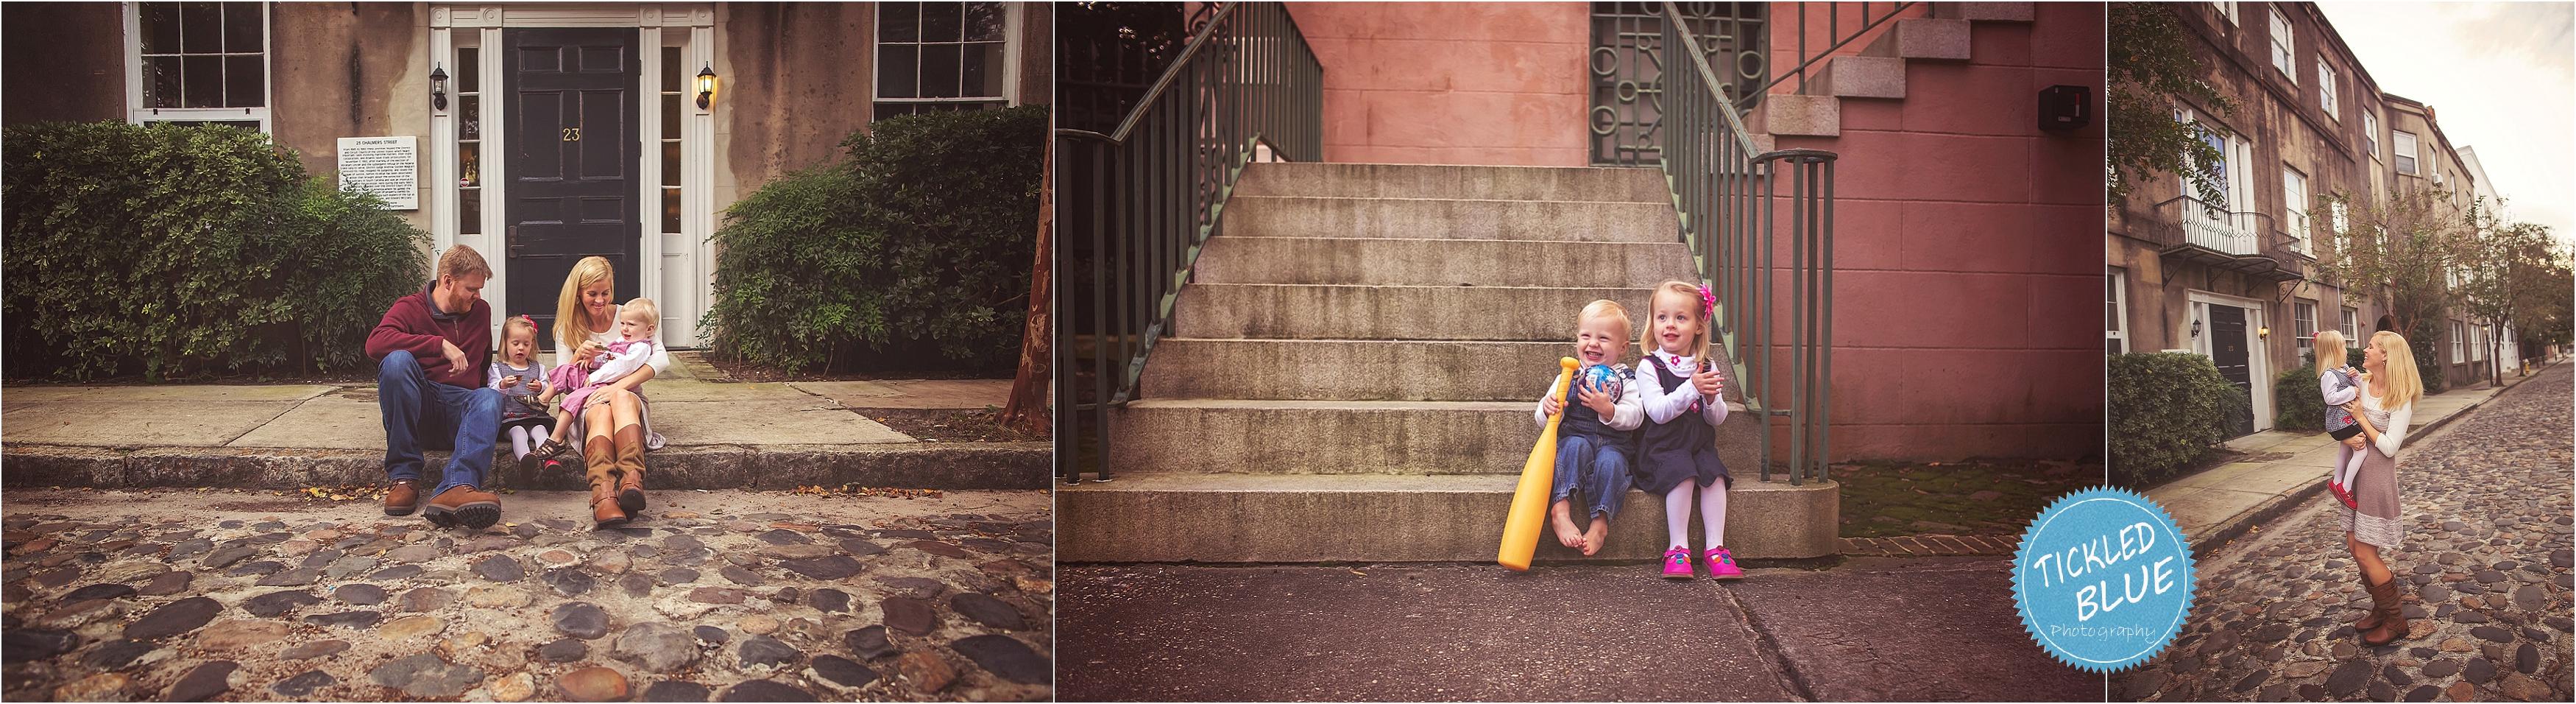 Tickled Blue_Charleston_sc_family_newborn_childrens_photographer_1600